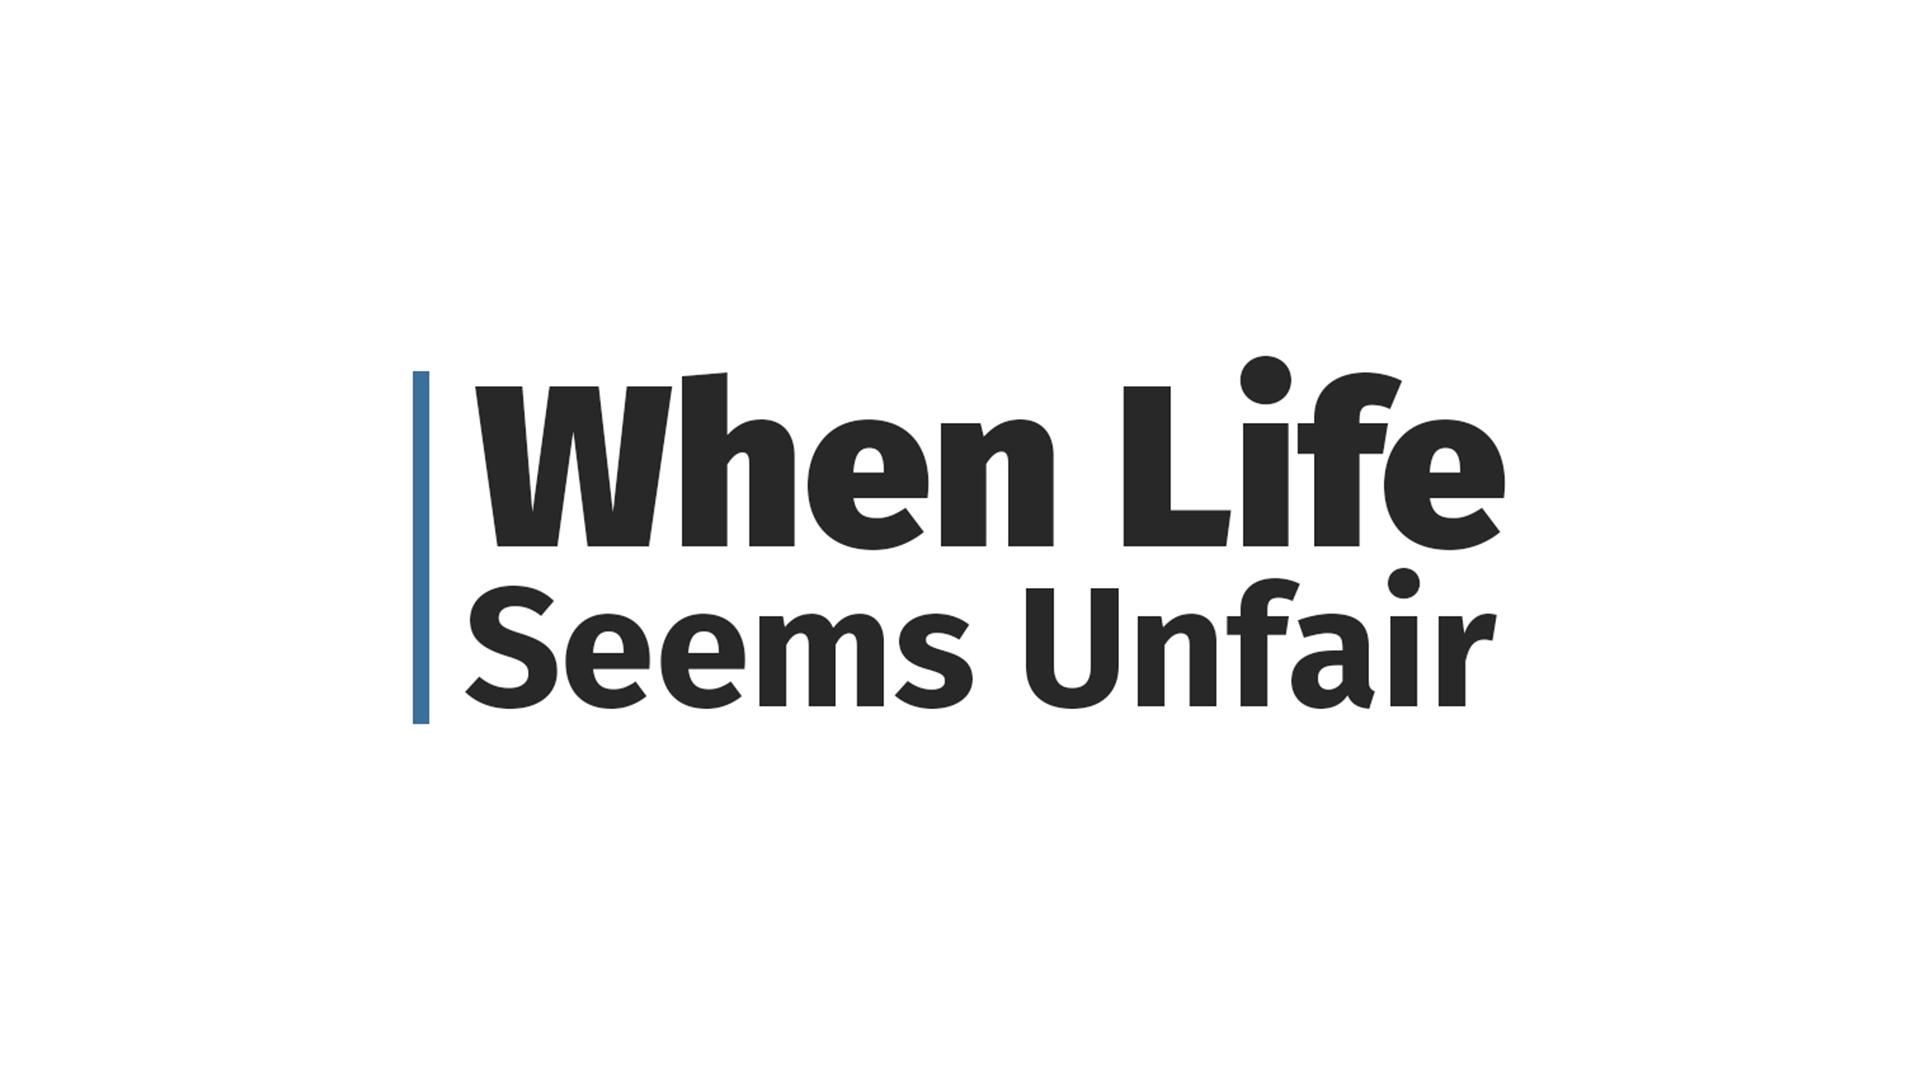 When Life Seems Unfair  - July 2017